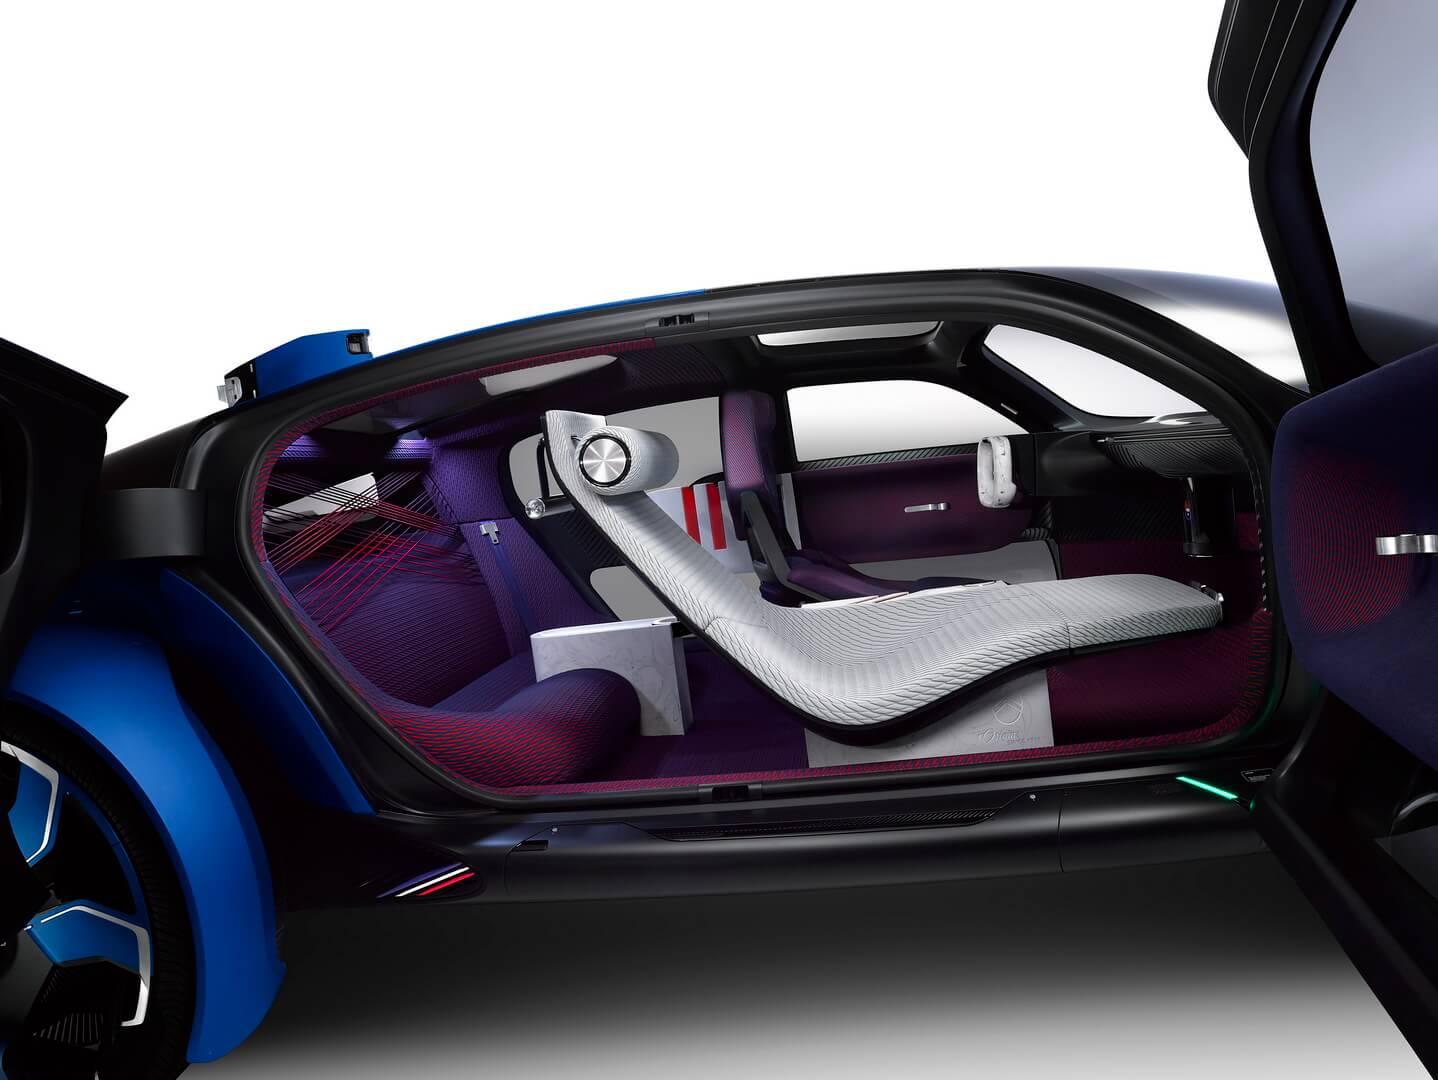 Салон футуристического электрокара Citroën 19_19